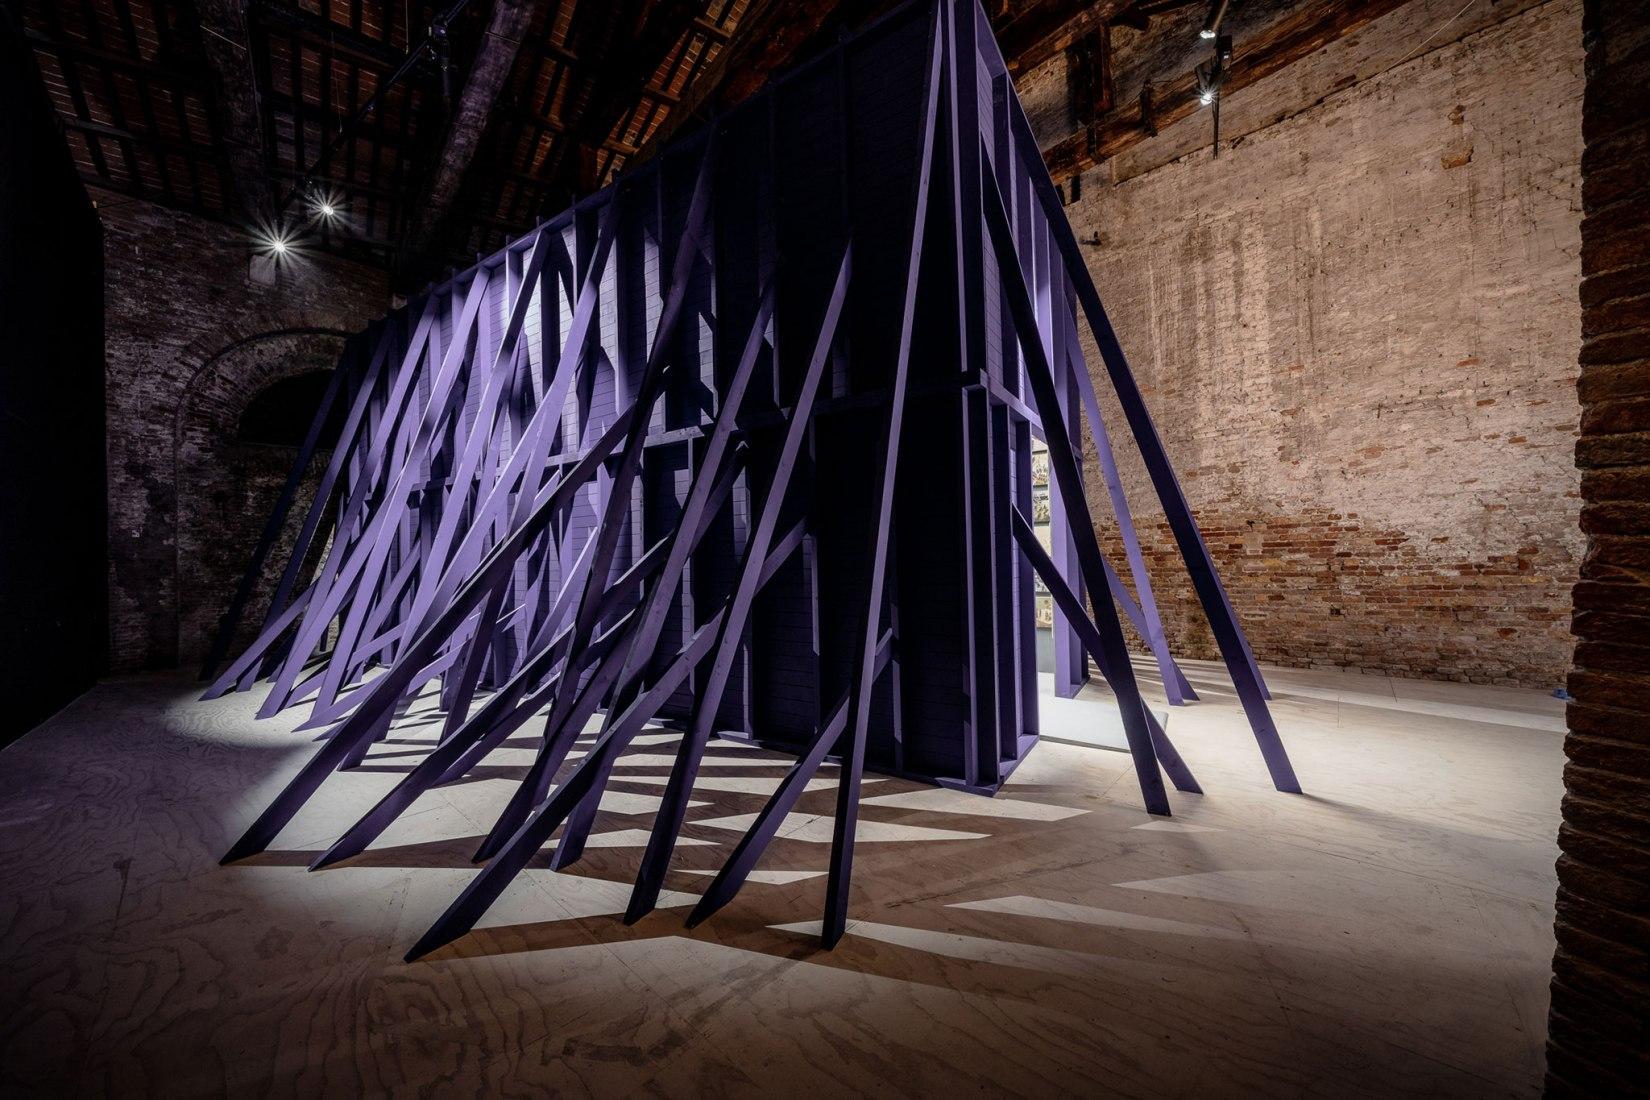 Pavilion of Chile at the Biennale di Venezia by Emilio Marín and Rodrigo Sepúlveda. Photograph by Andrea Avezzù.